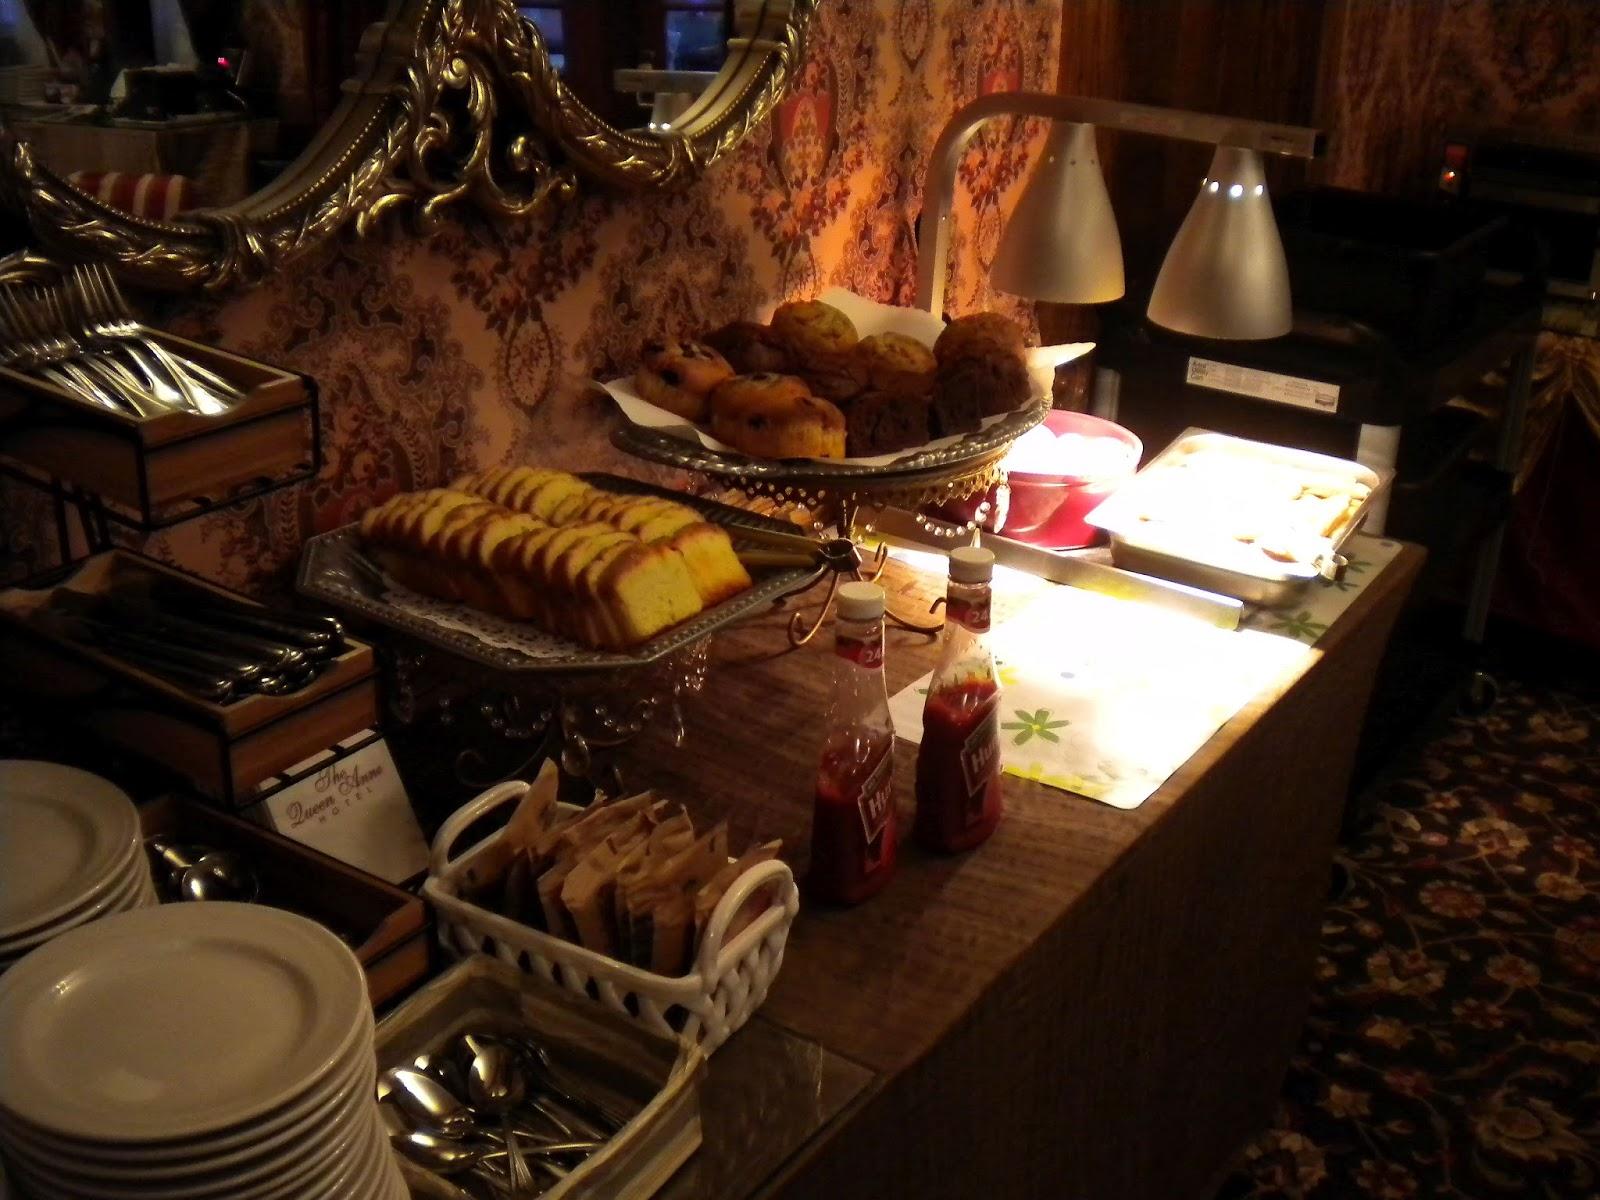 san francisco hotel queen anne hotelli mallaspulla matkailu aamiainen